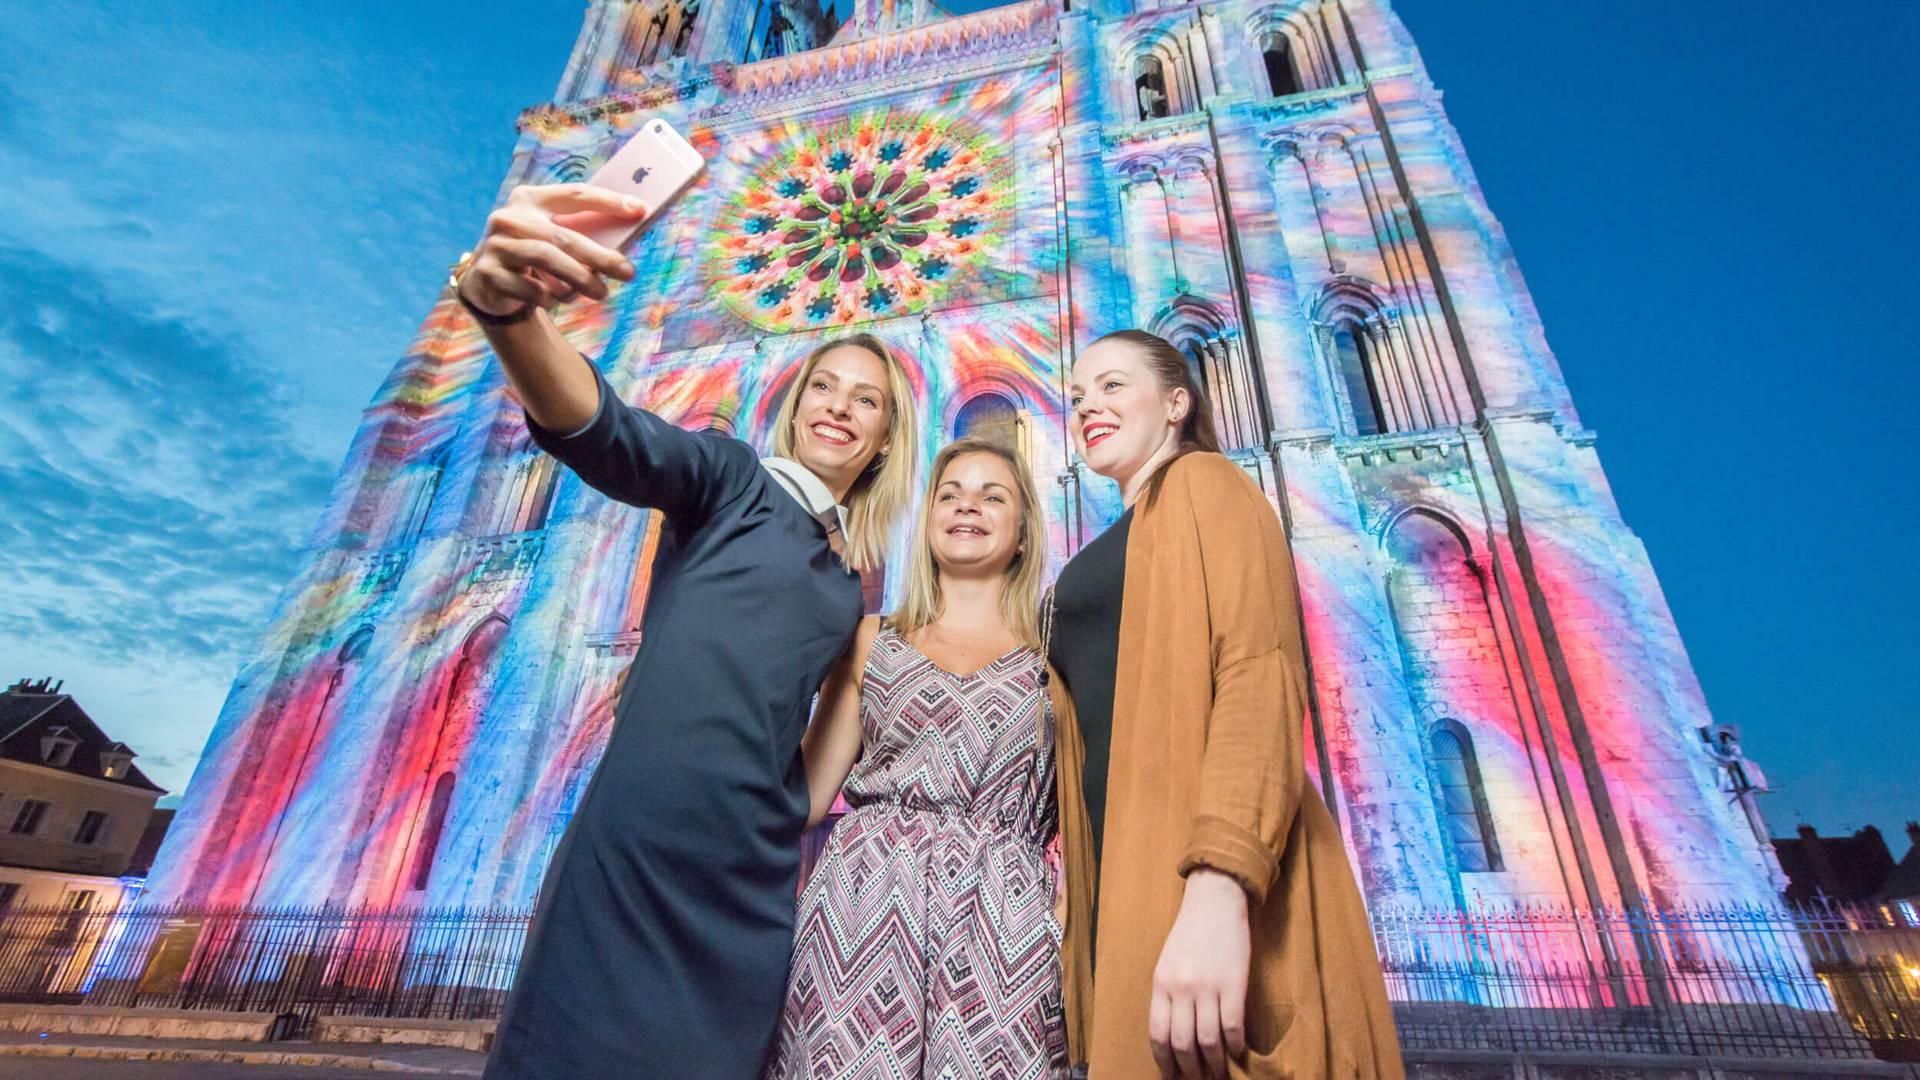 S'émerveiller devant Chartres en lumières